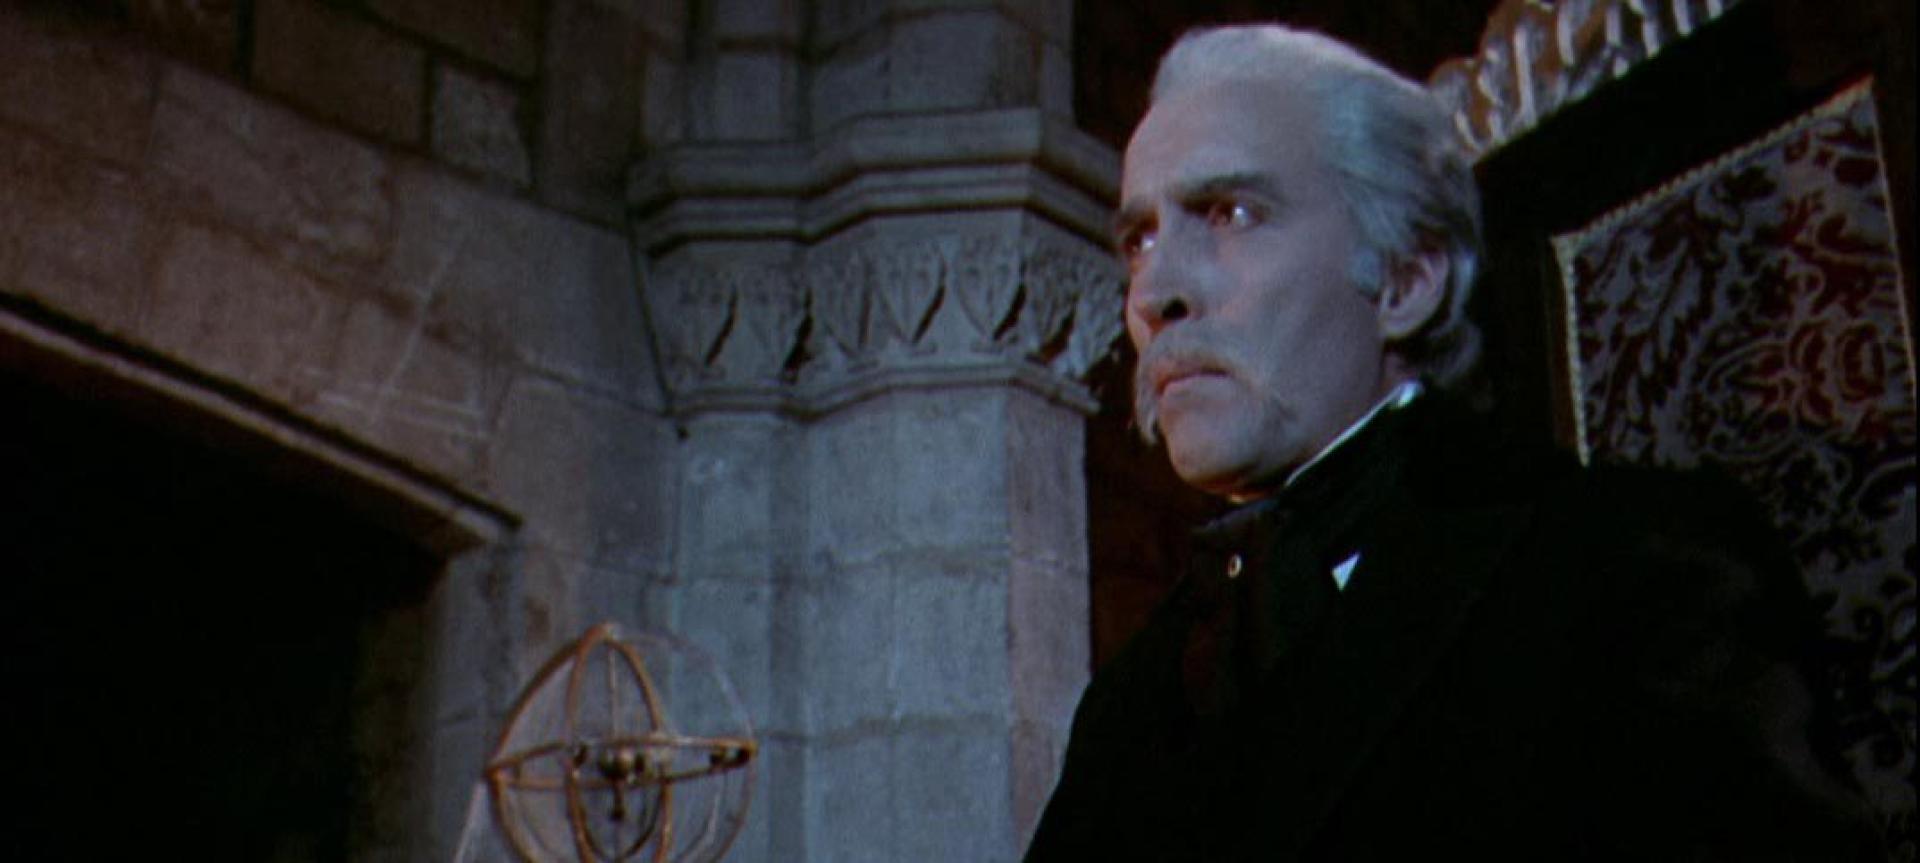 Nachts, wenn Dracula erwacht - Drakula gróf (1970) 2. kép